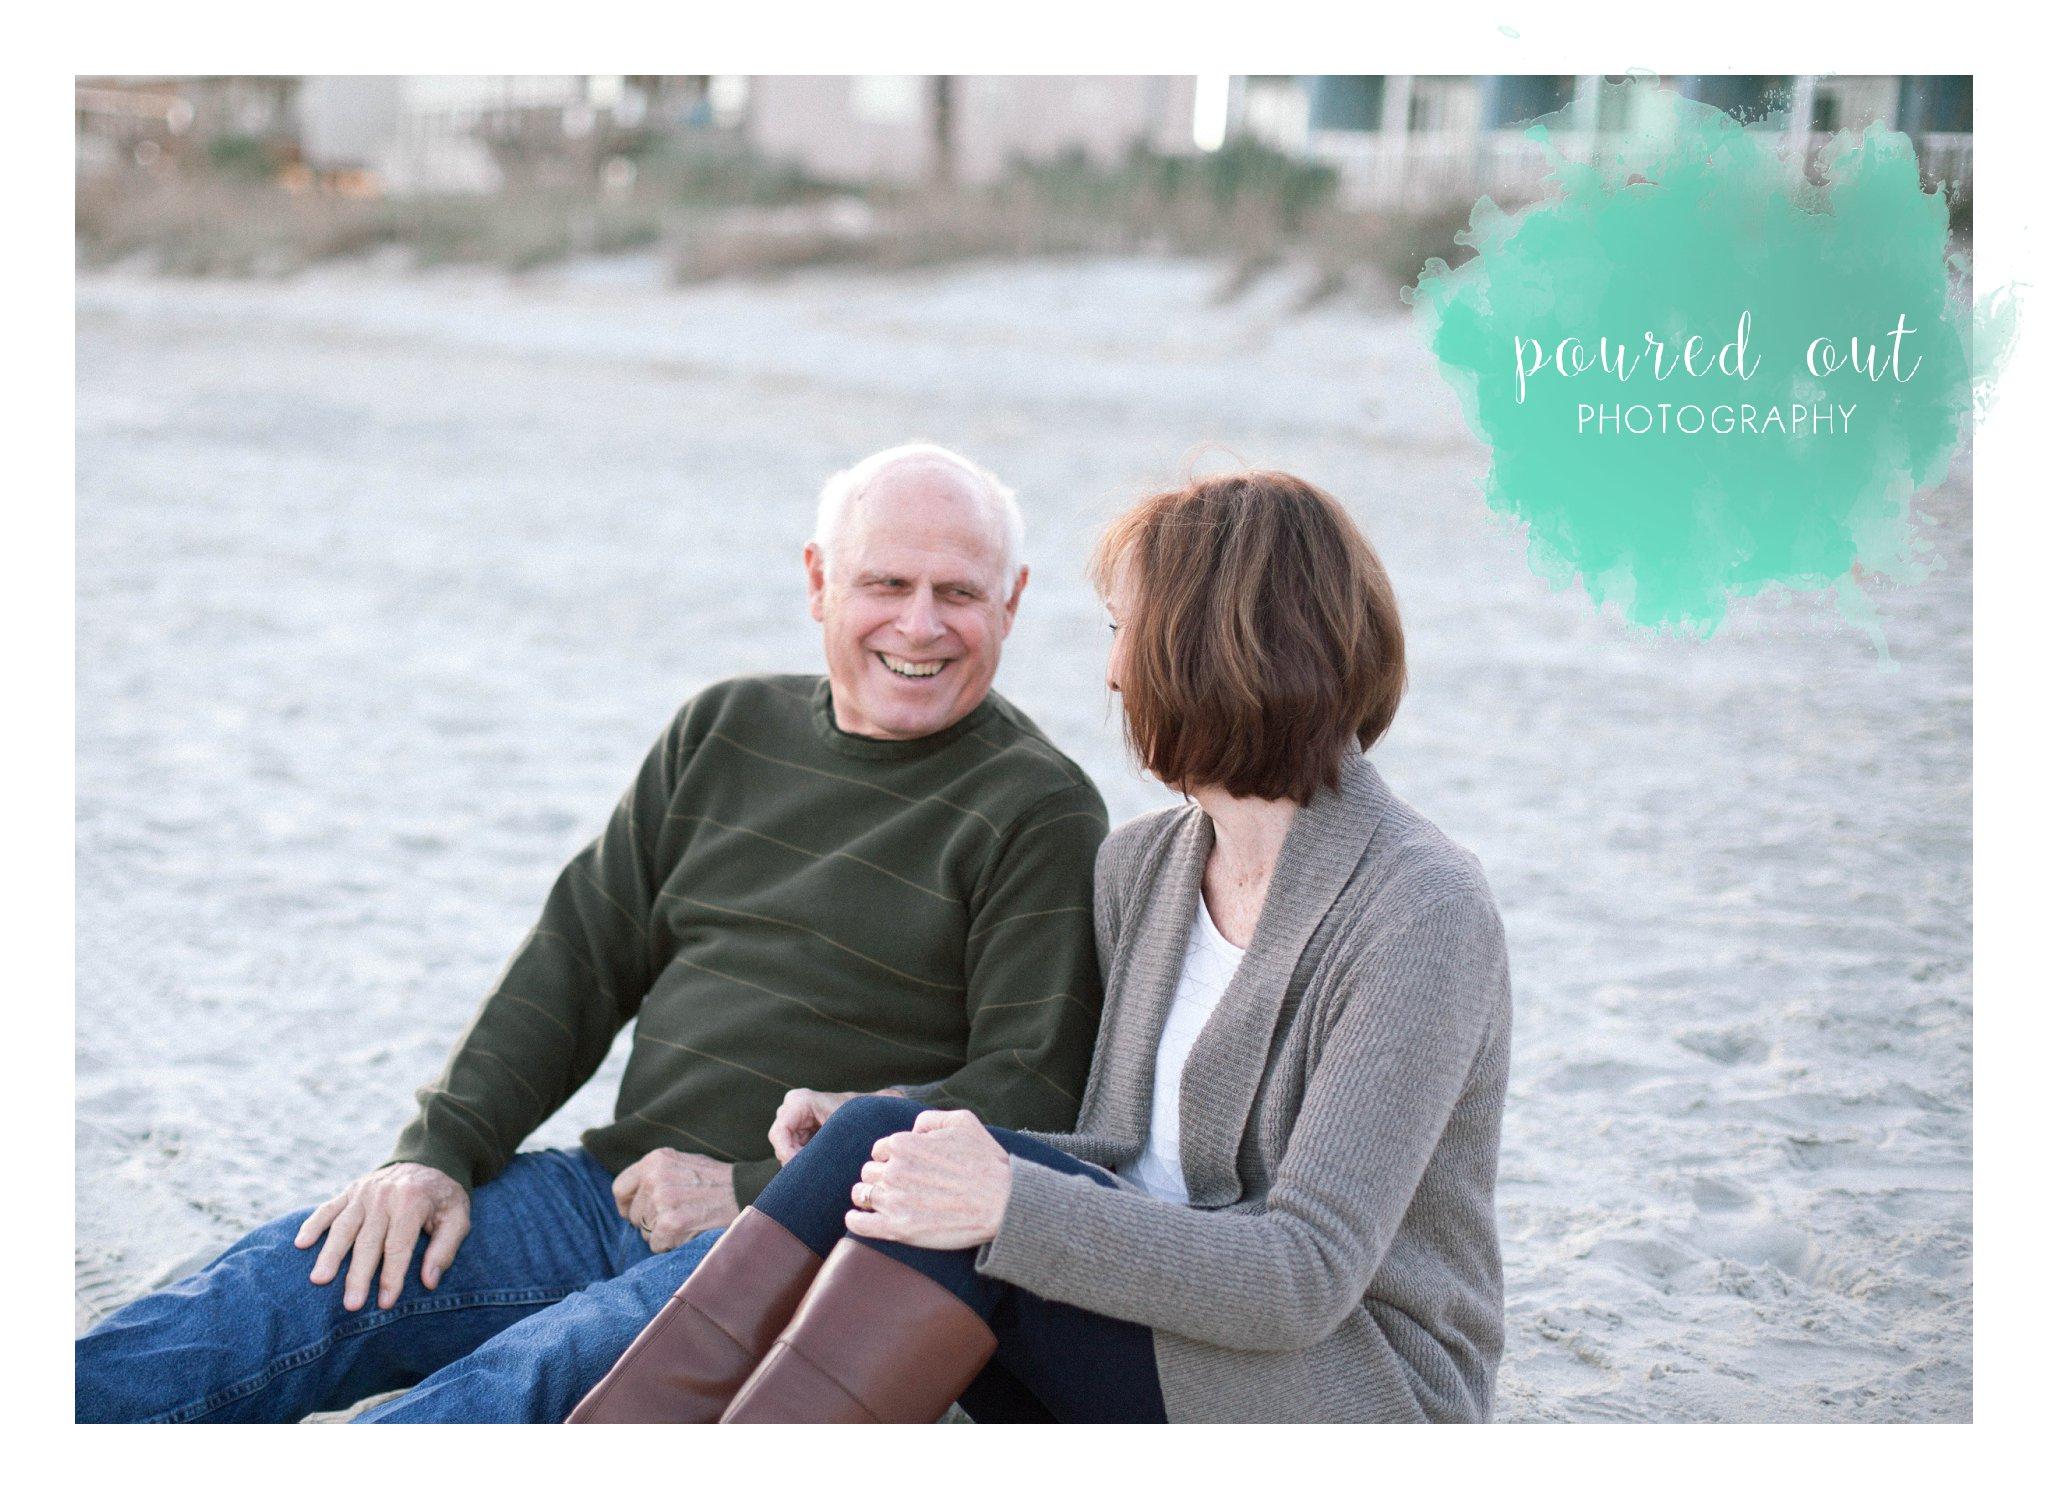 garden city pier, poured out photography, couple, beach, dogs